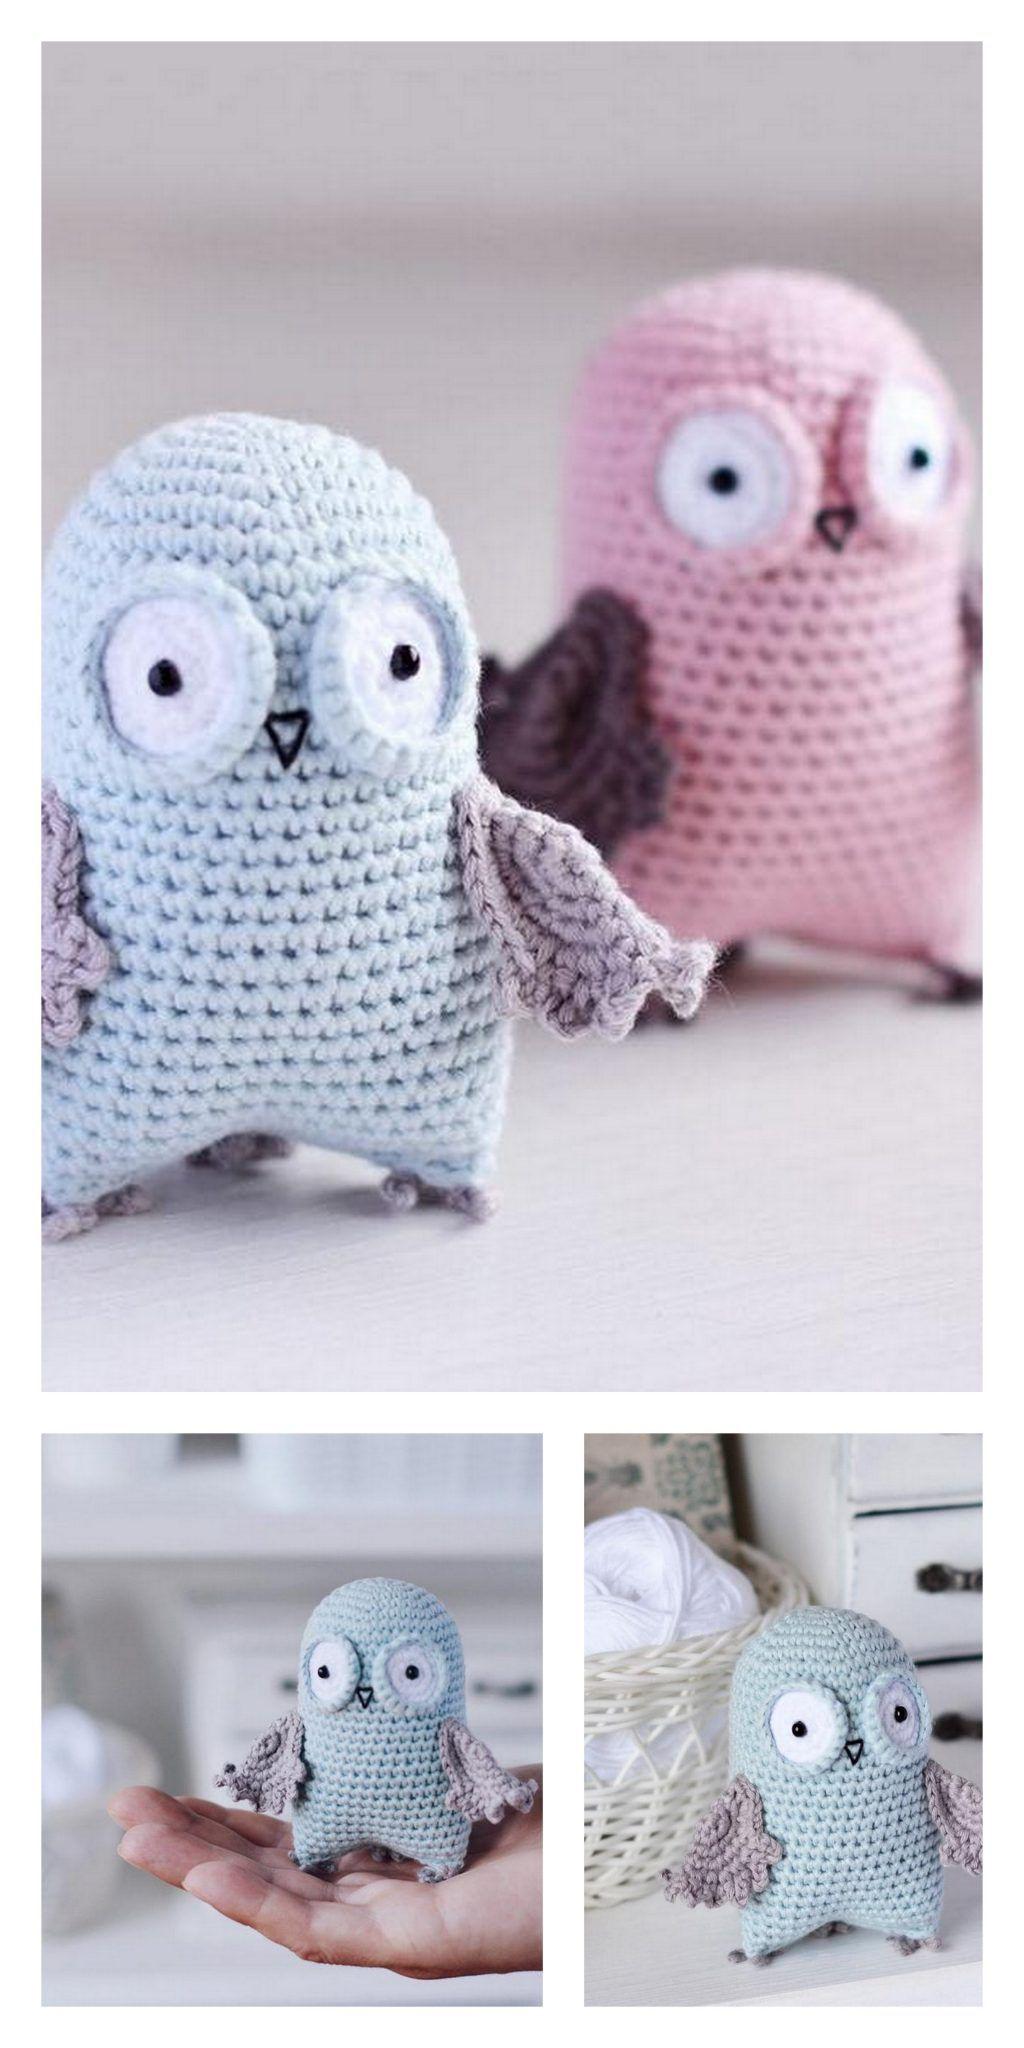 Crochet Owl Amigurumi Mr. Murasaki/ Sleepy Owl/ Baby Owl/ | Etsy | 2048x1024